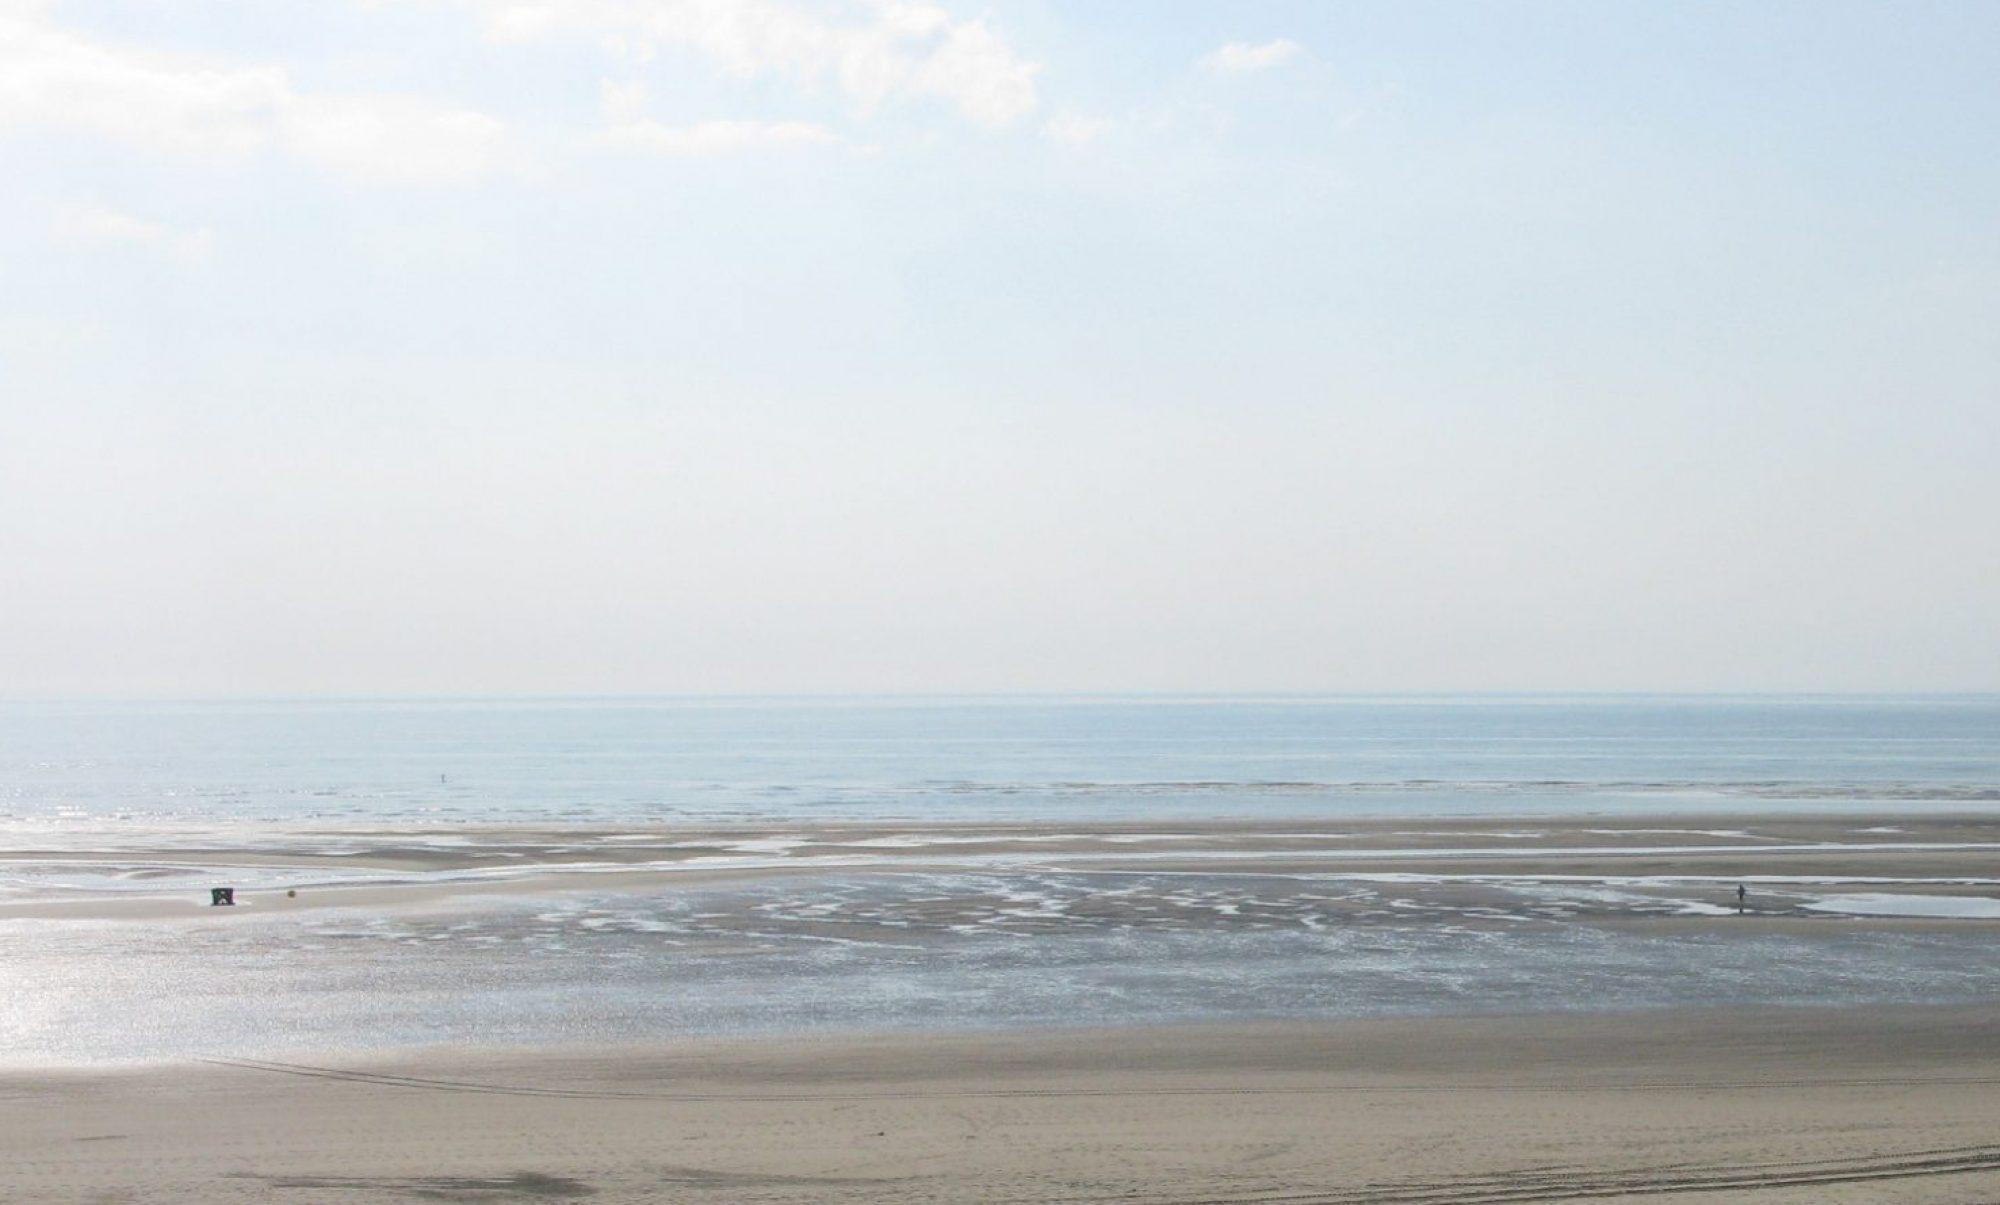 Résidence Altéia - Berck sur mer